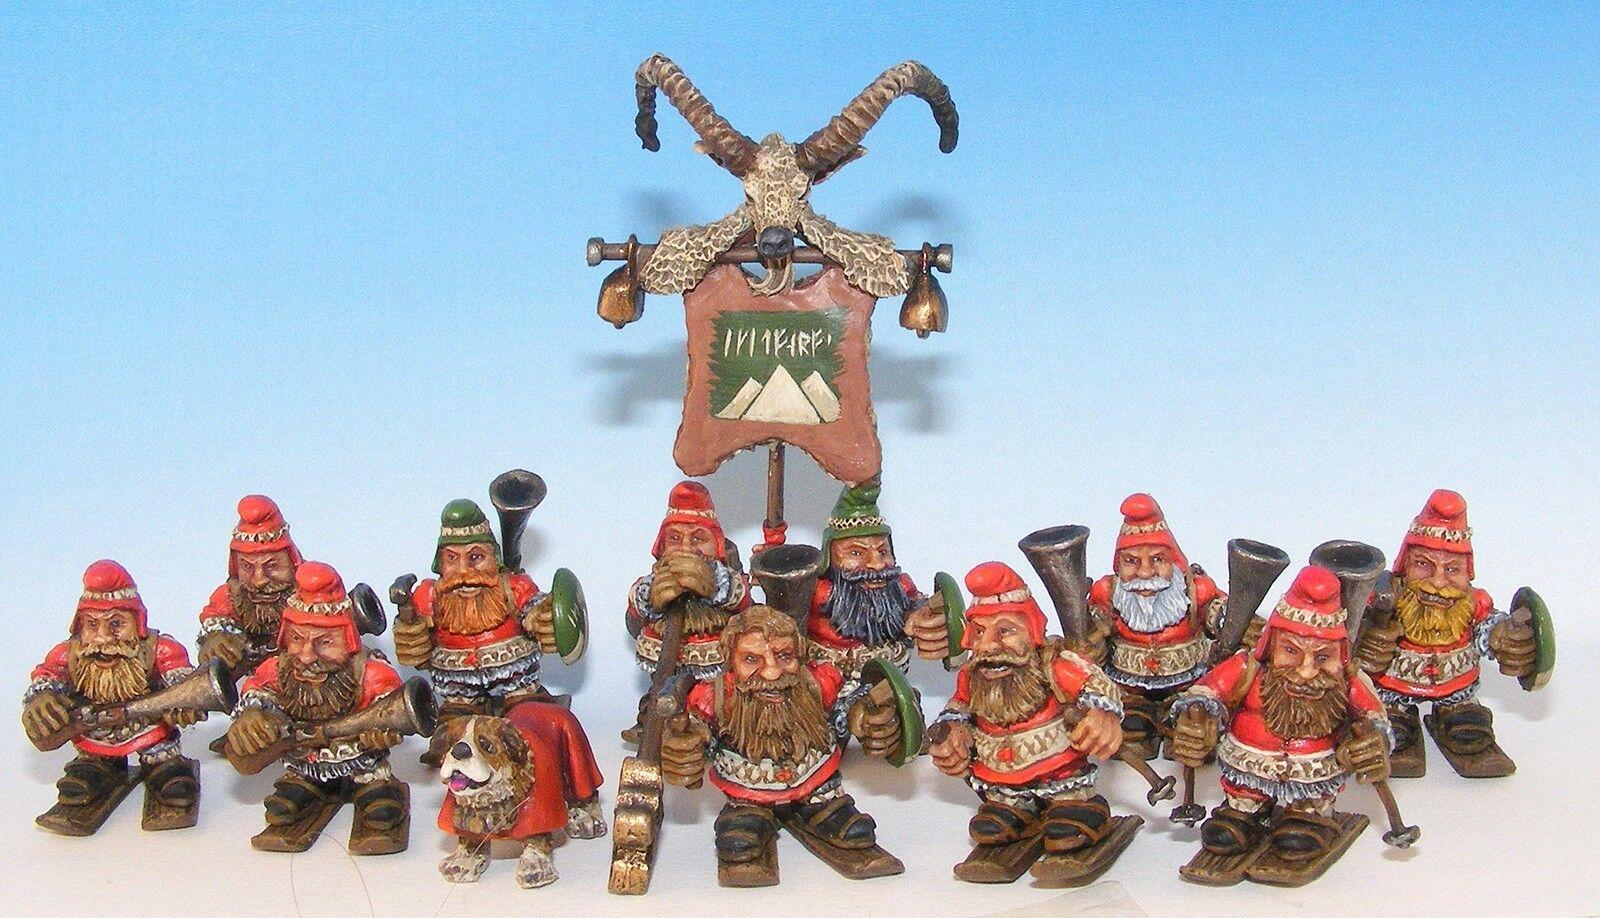 Dwarfs On Skis warhammer metal dwarf mountaineers oldhammer Warhammer Aofs